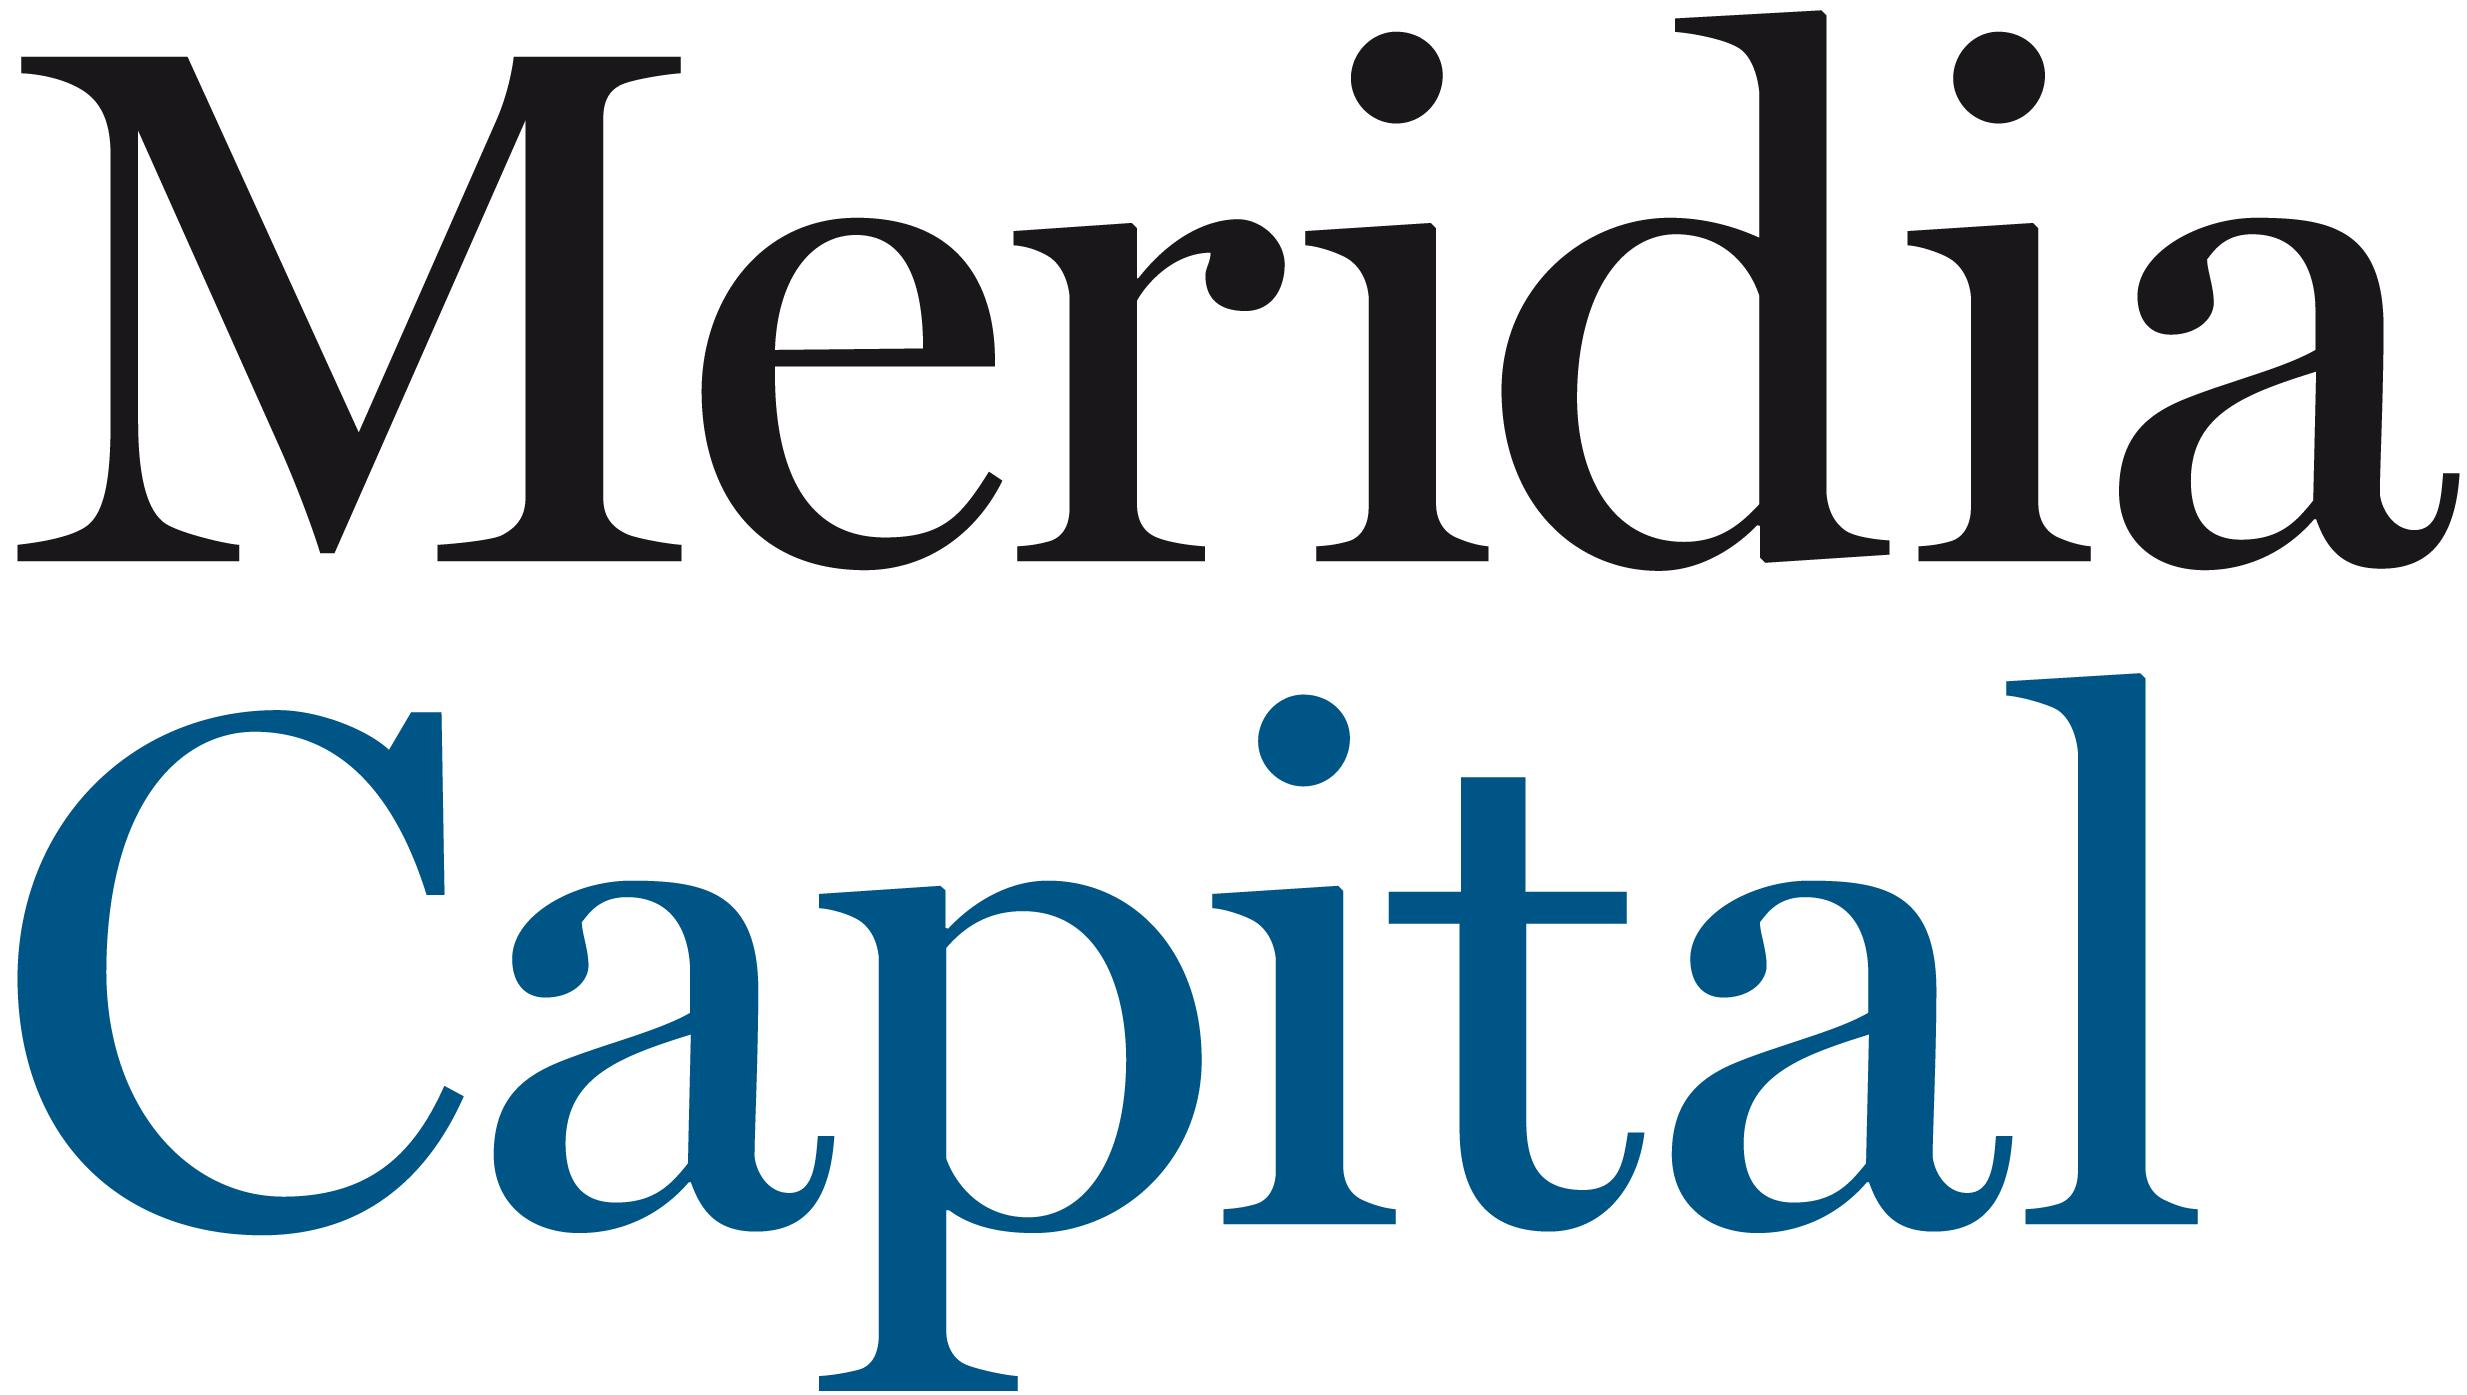 Meridia Capital